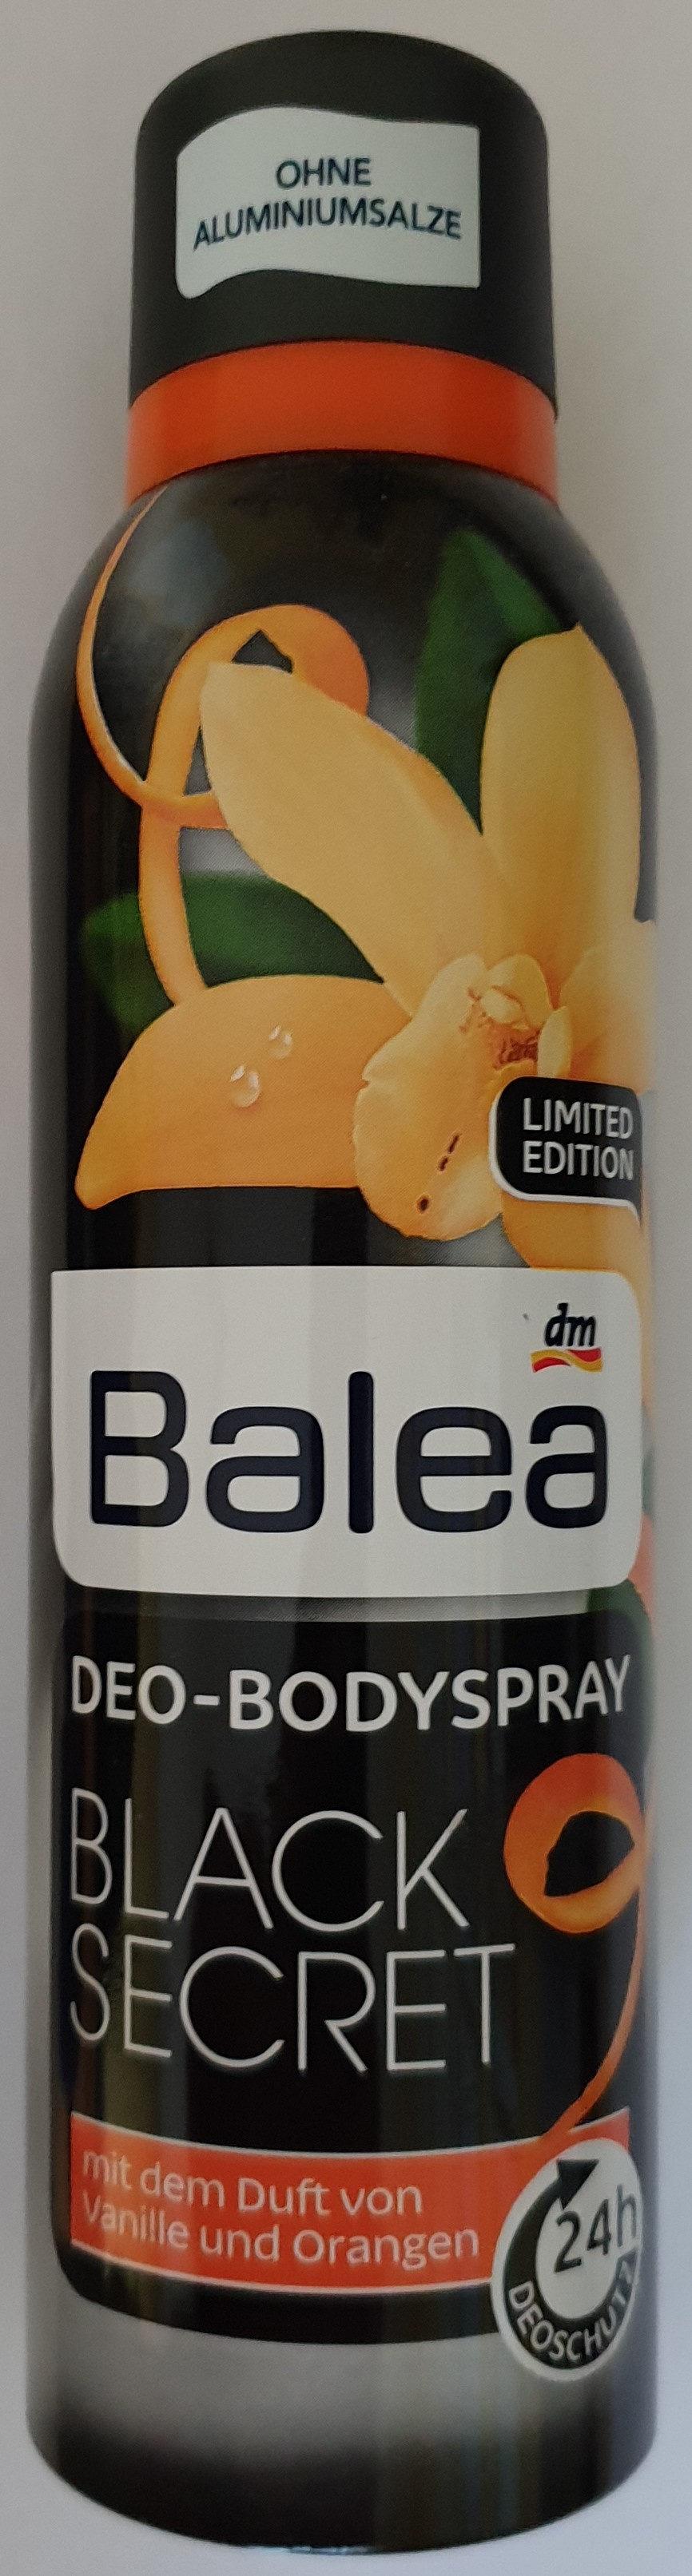 deo-Bodyspray Black Secret - Product - de